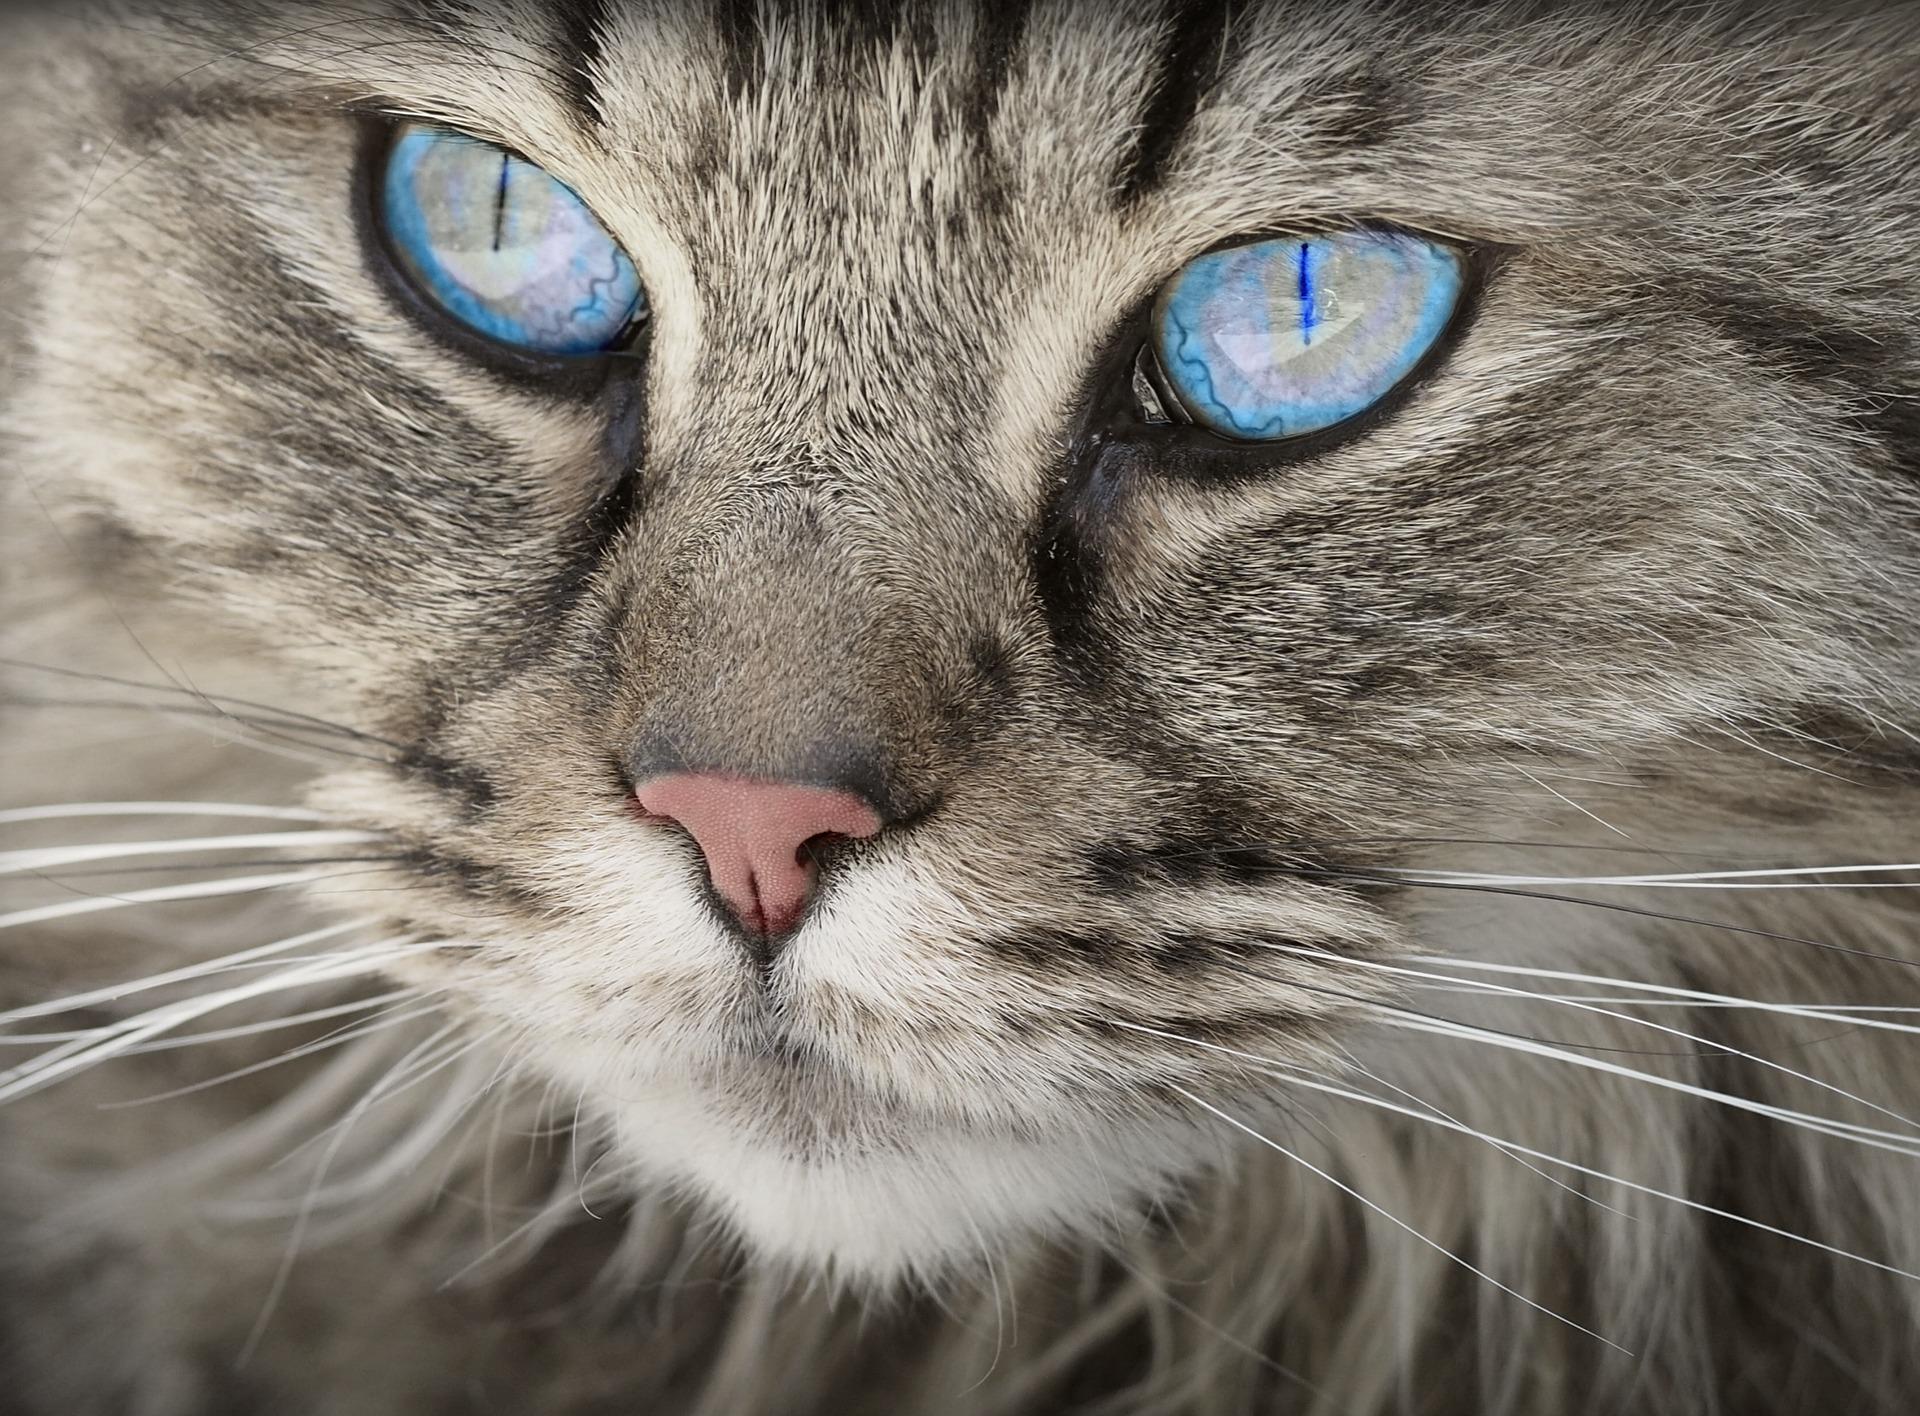 gato, Katze, Gesicht, Augen, Blau, Haustier - Wallpaper HD - Prof.-falken.com